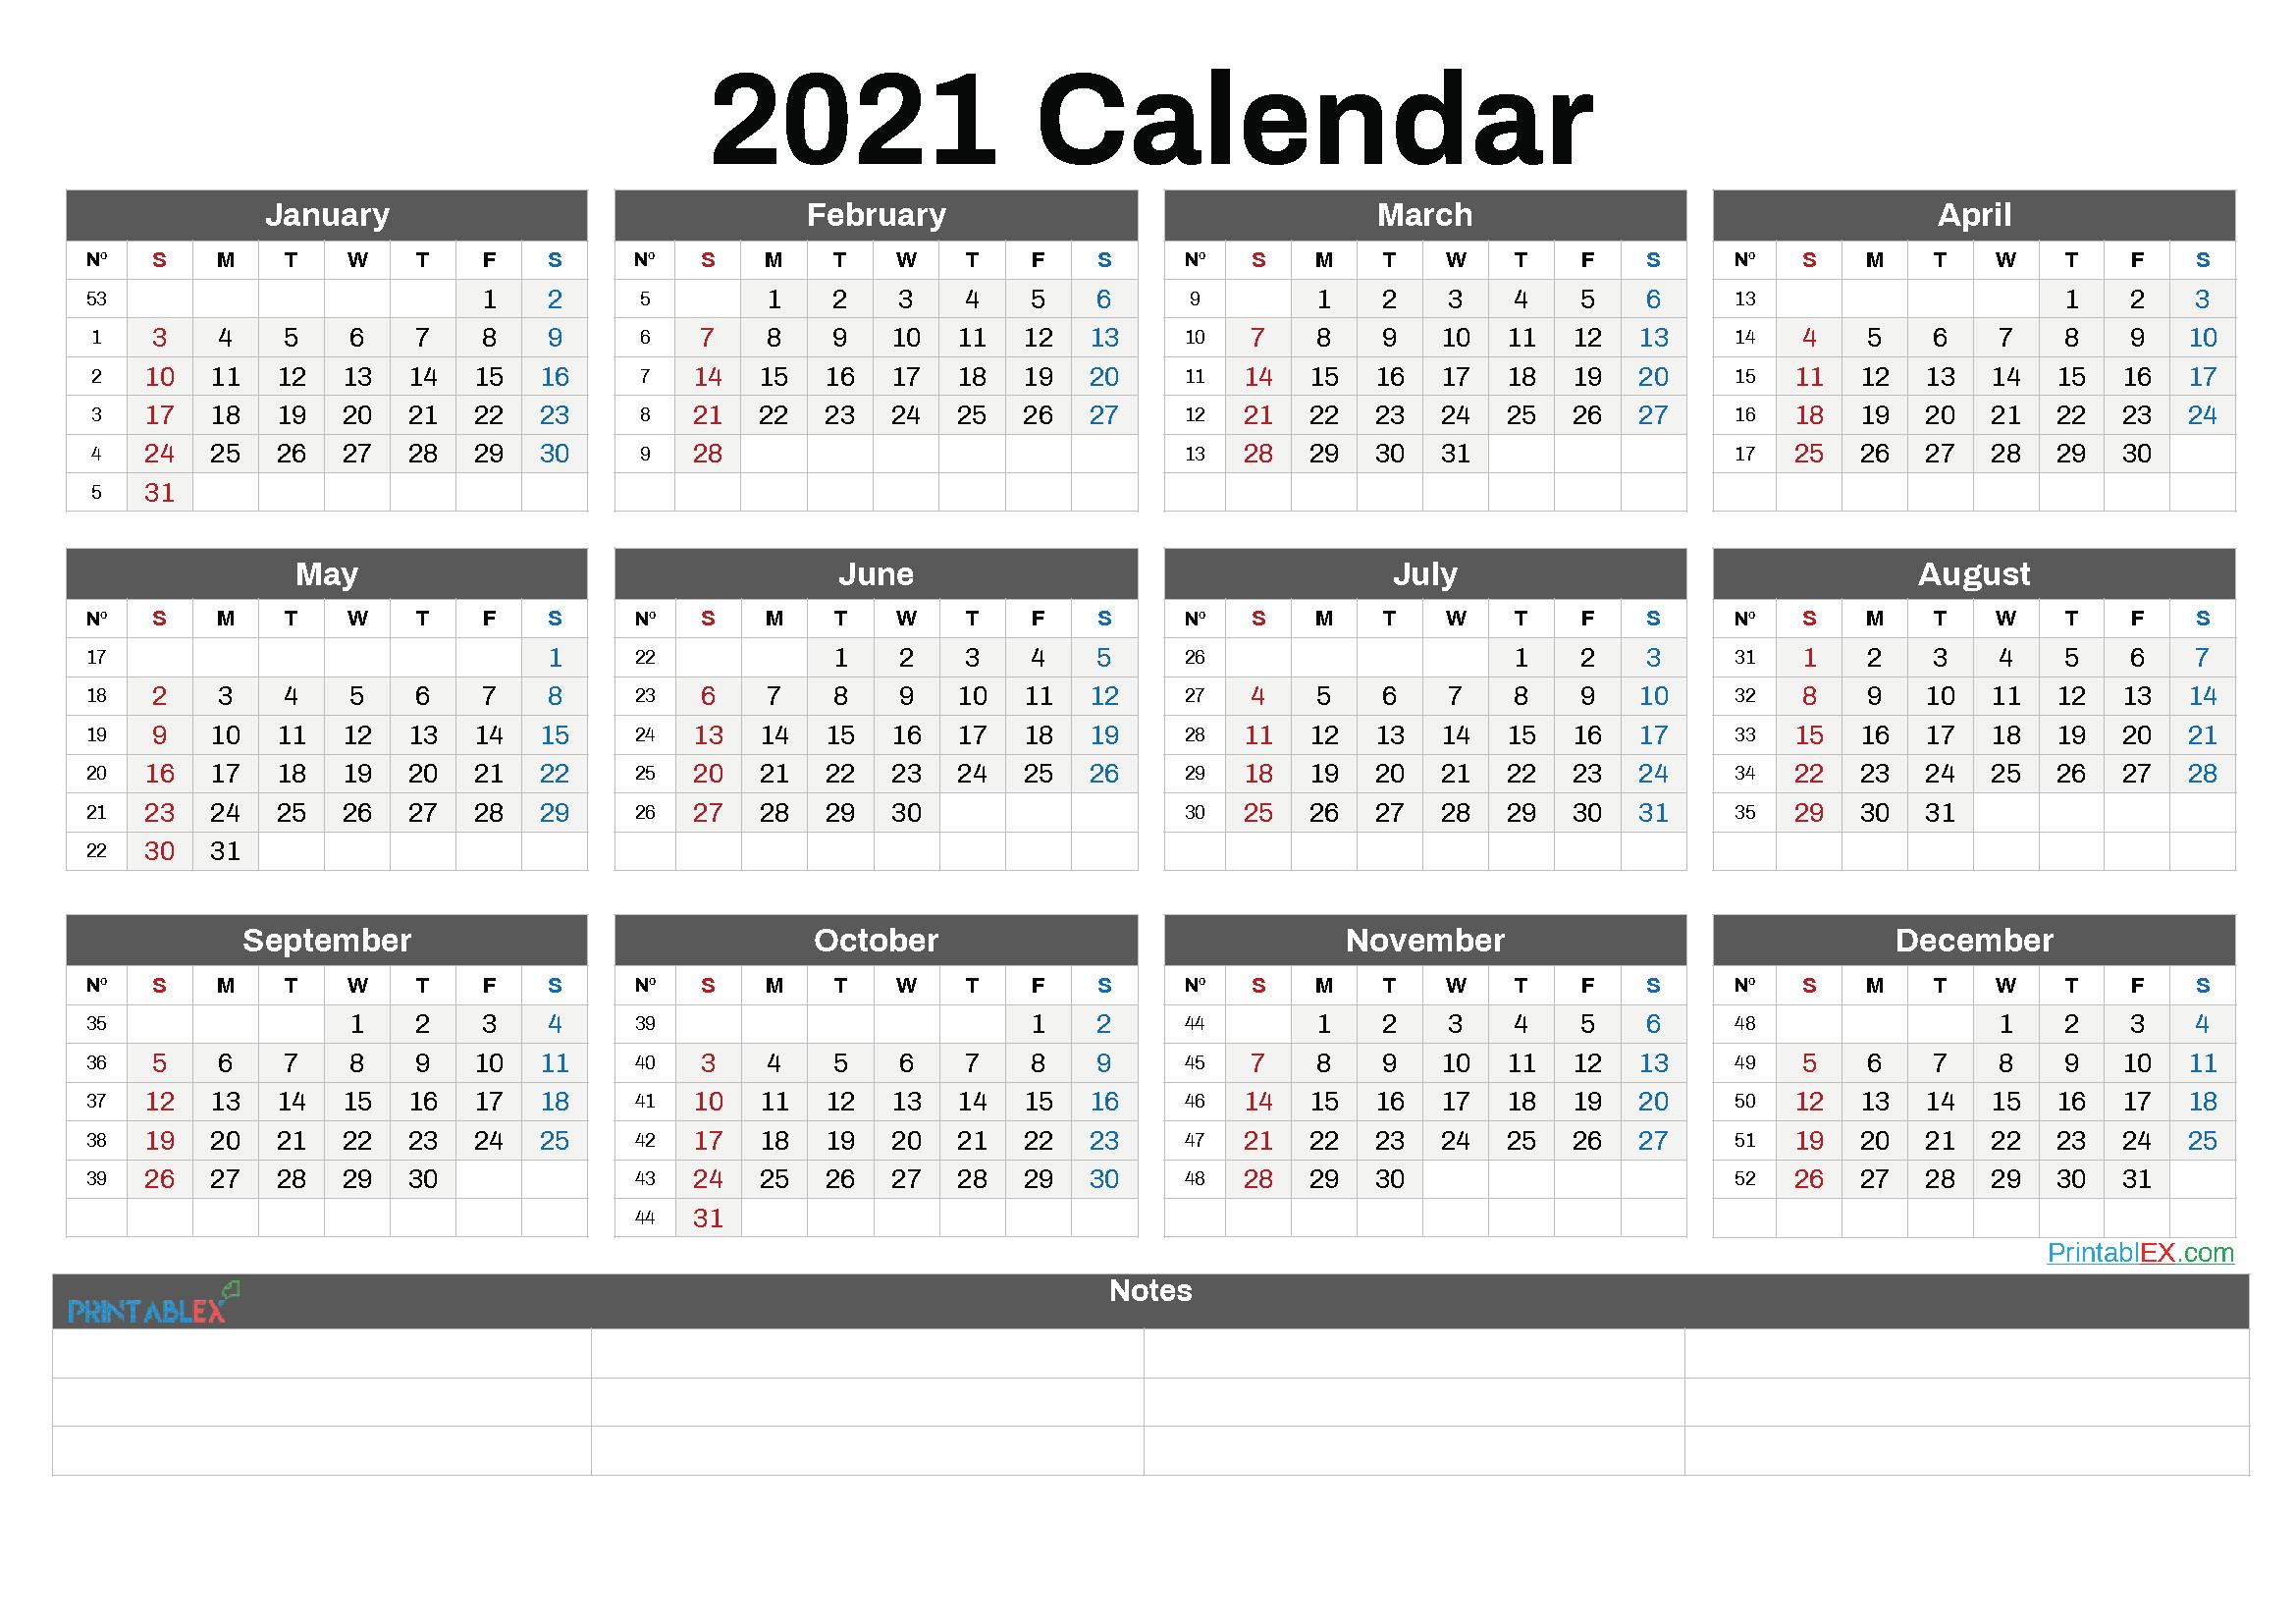 2021 2021 Calendar Printable - Calendar Printable Free